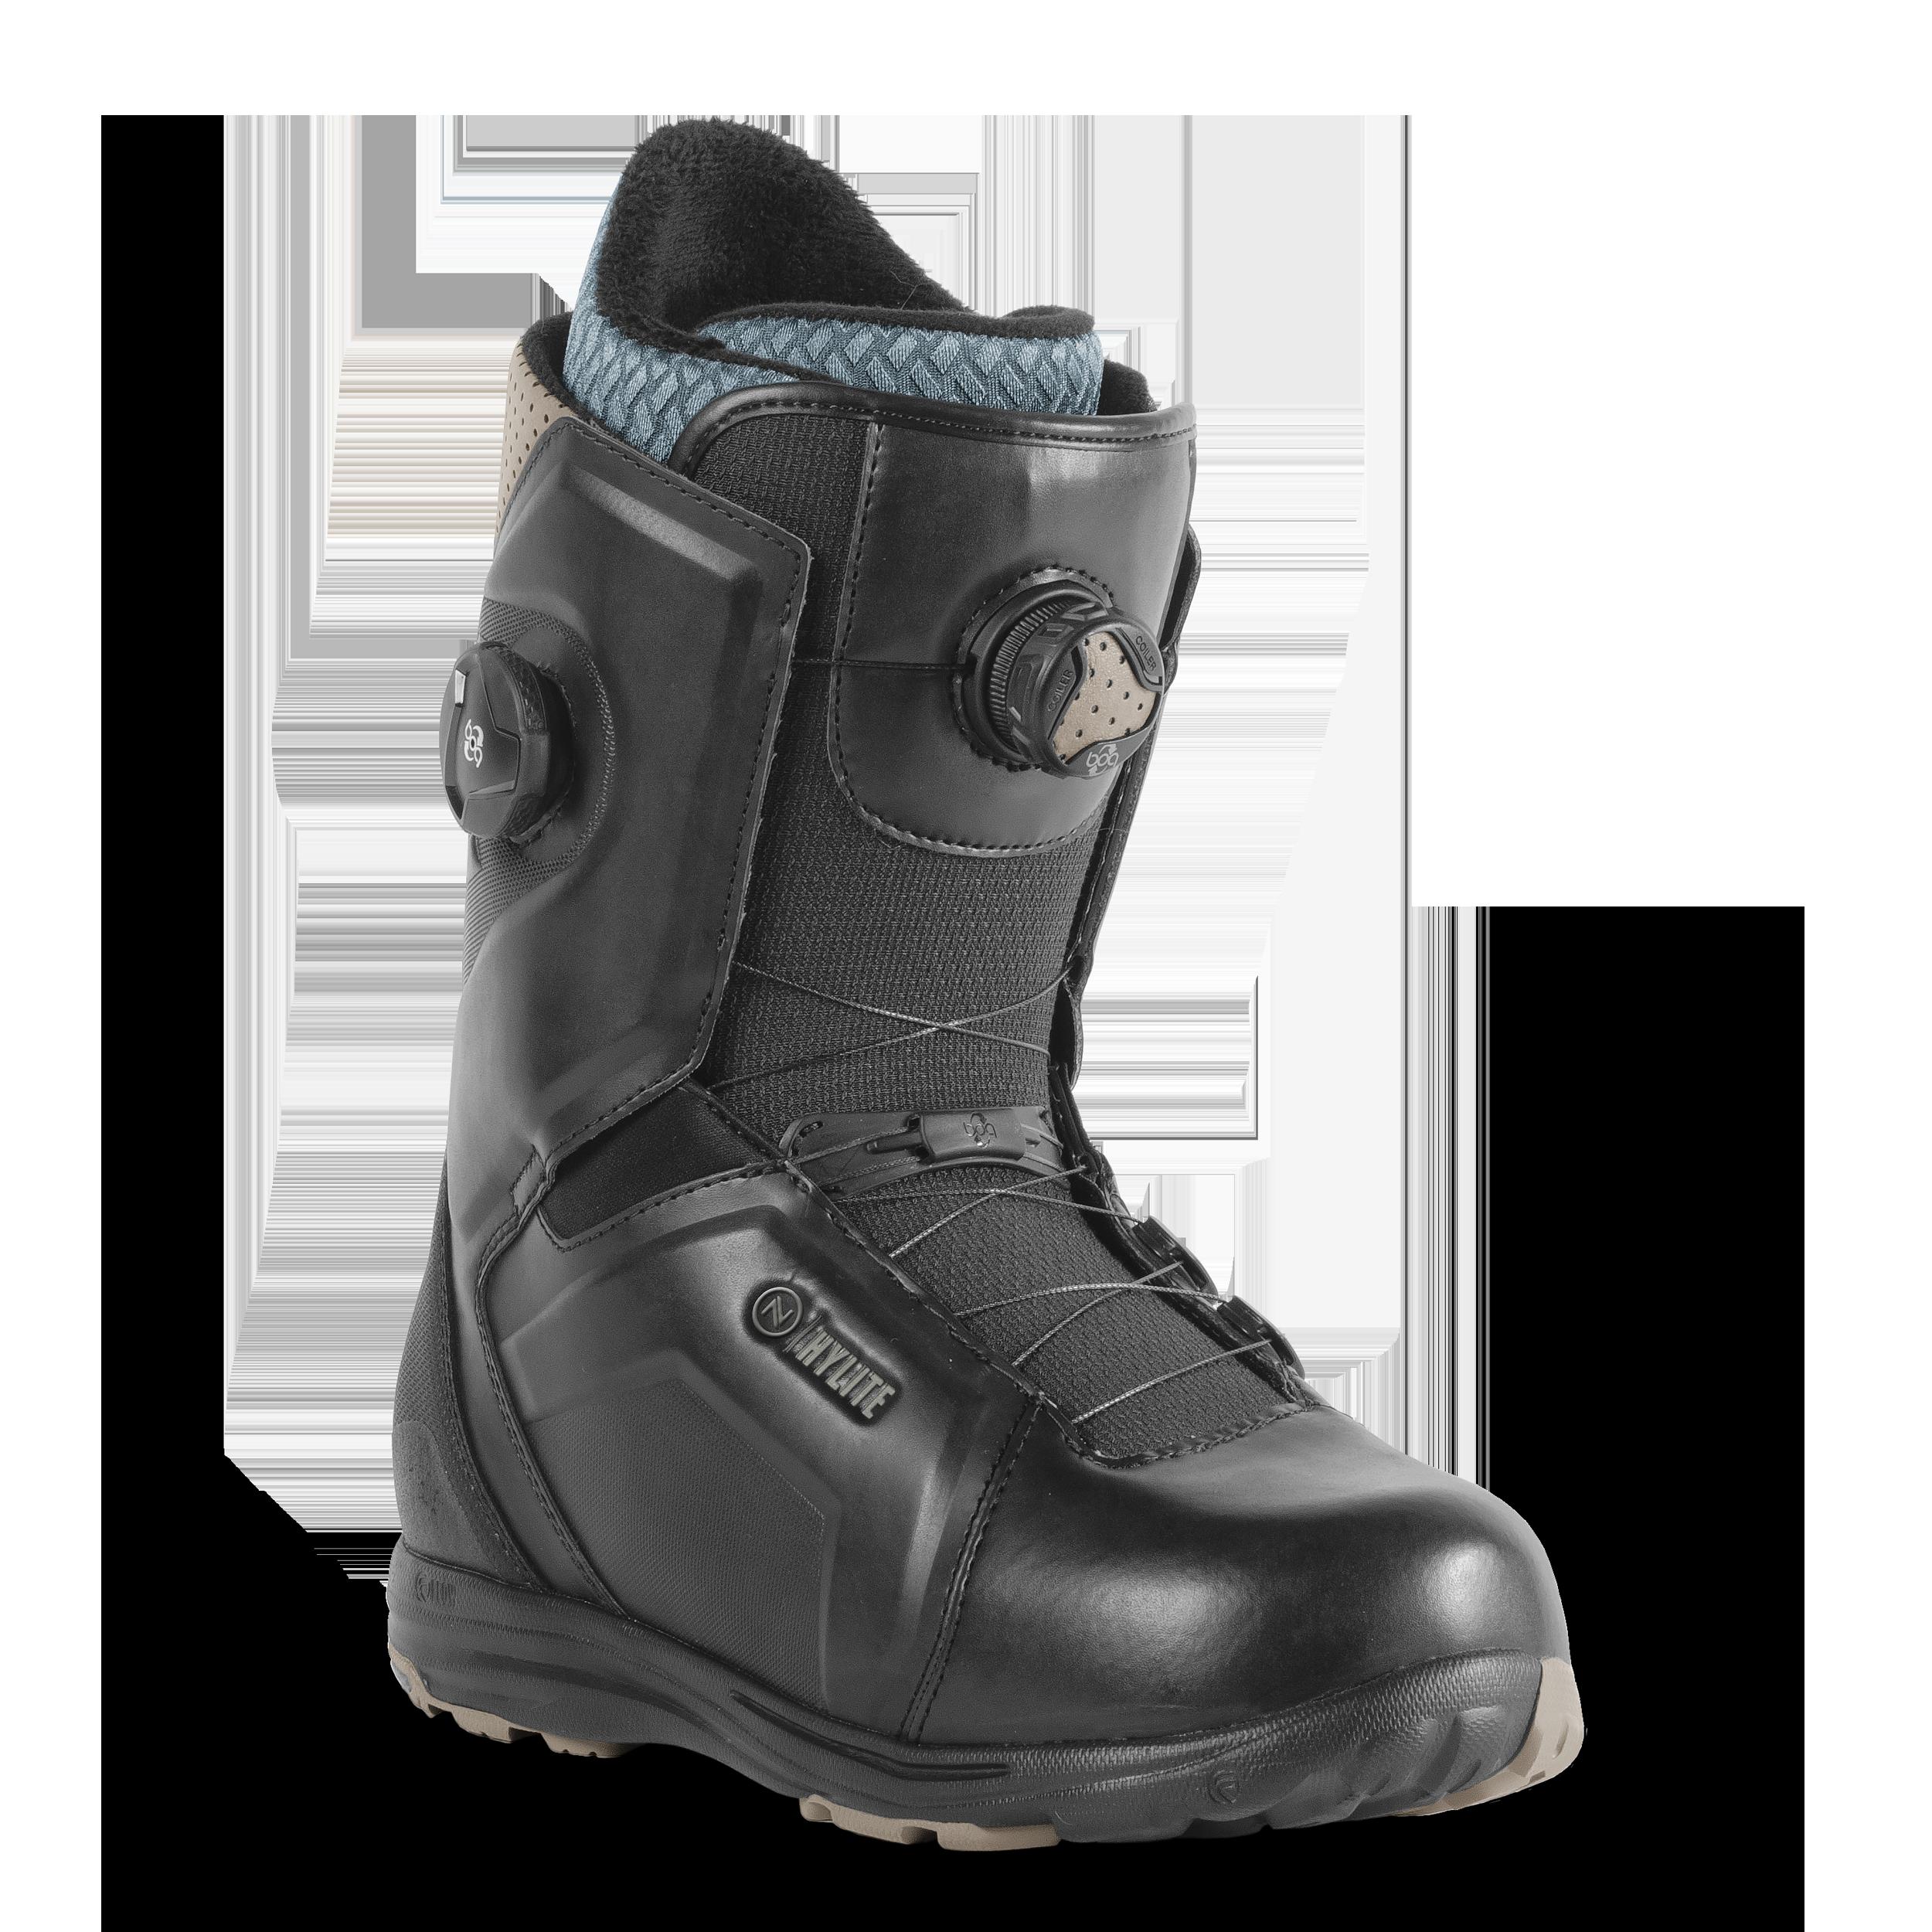 Ботинки для сноуборда NIDECKER 2017-18 FLOW HYLITE H-LOCK FOCUS BLACK